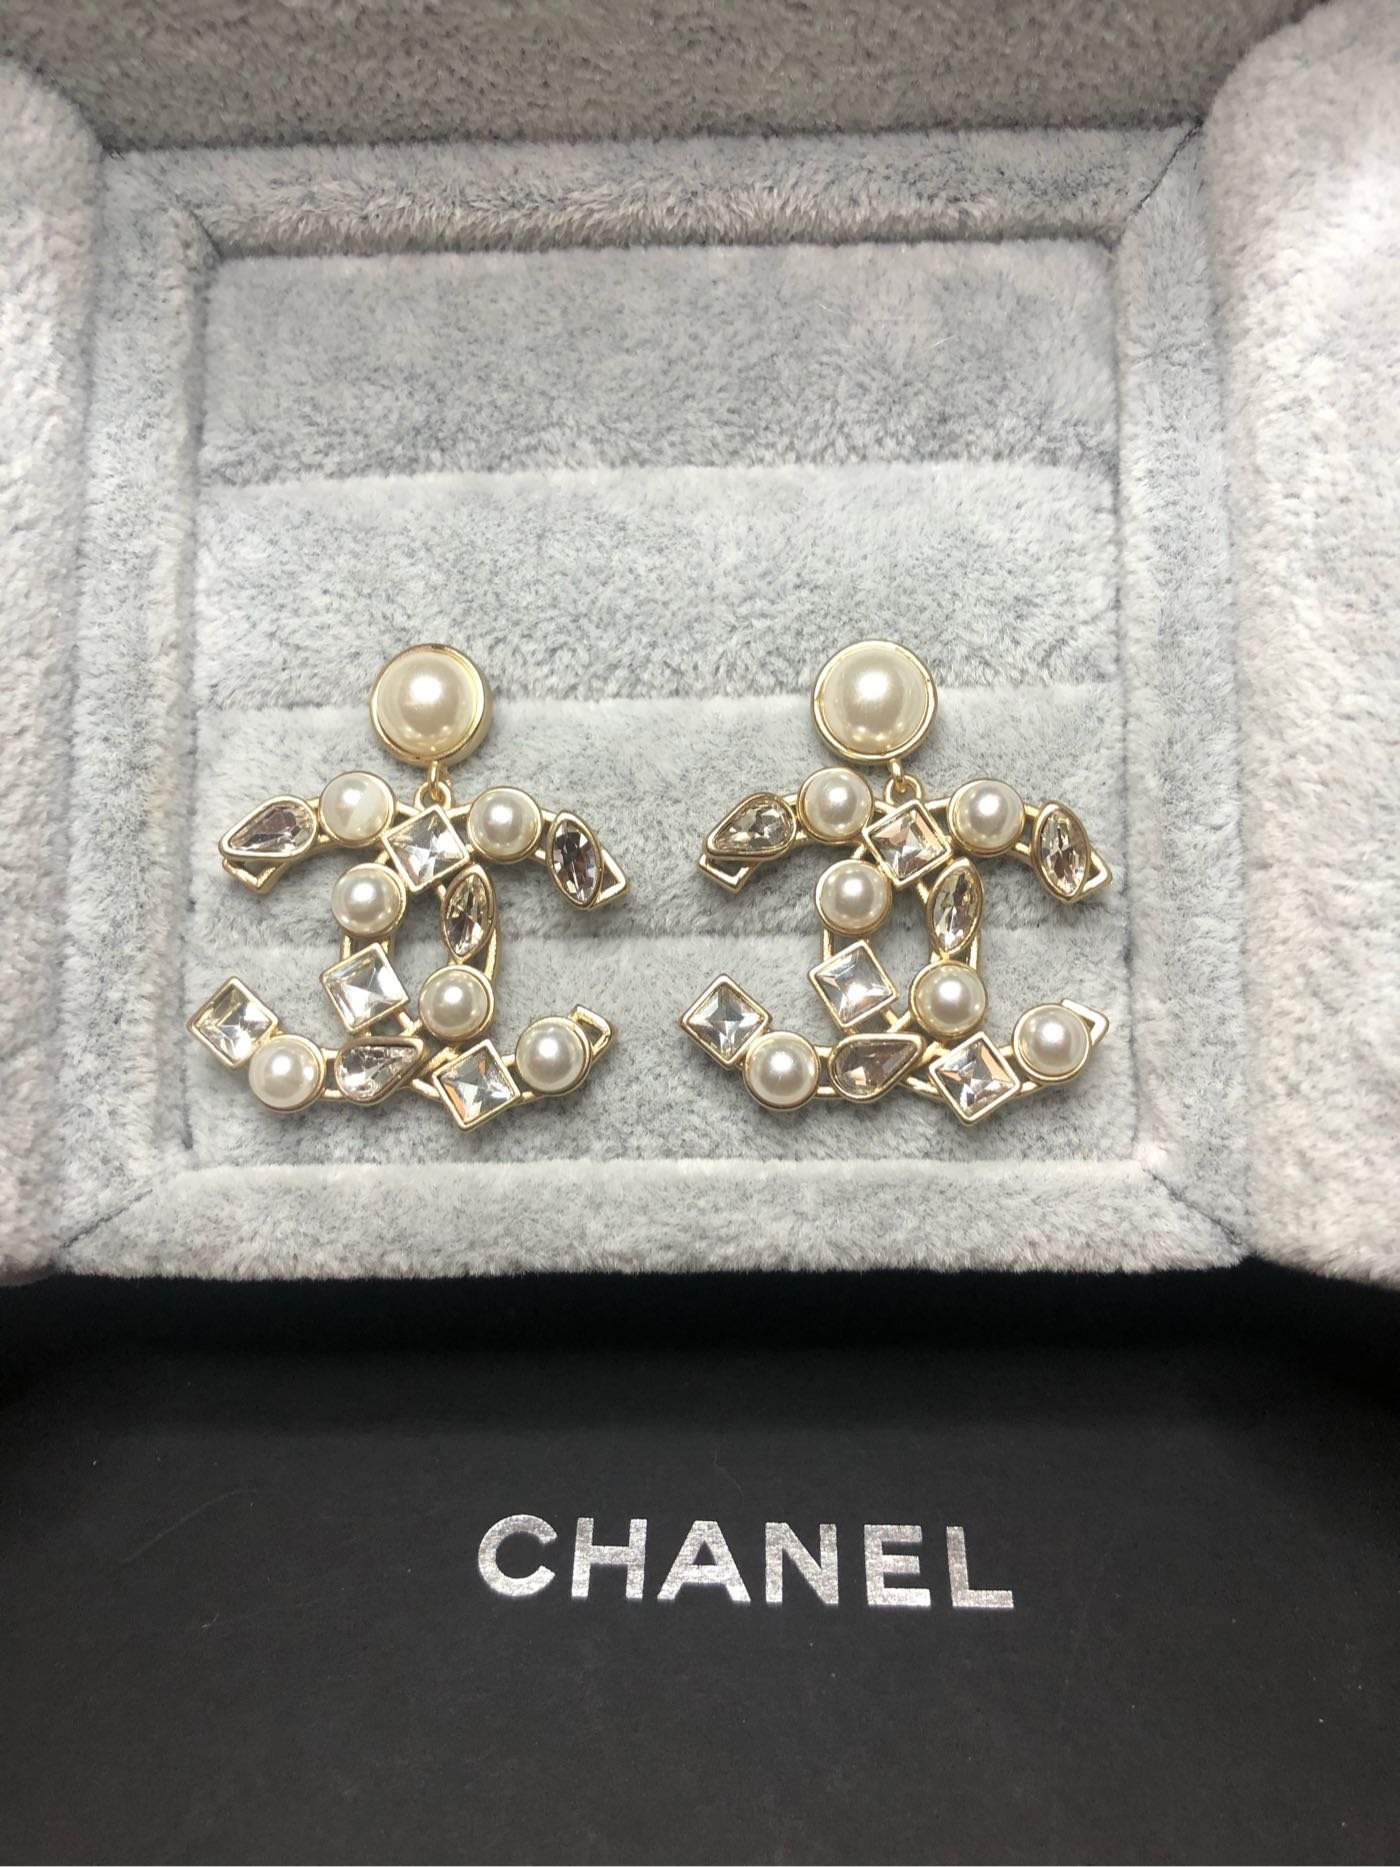 CHANEL 香奈兒 二手 超美 珍珠 水滴 水鑽 小垂墜式耳環